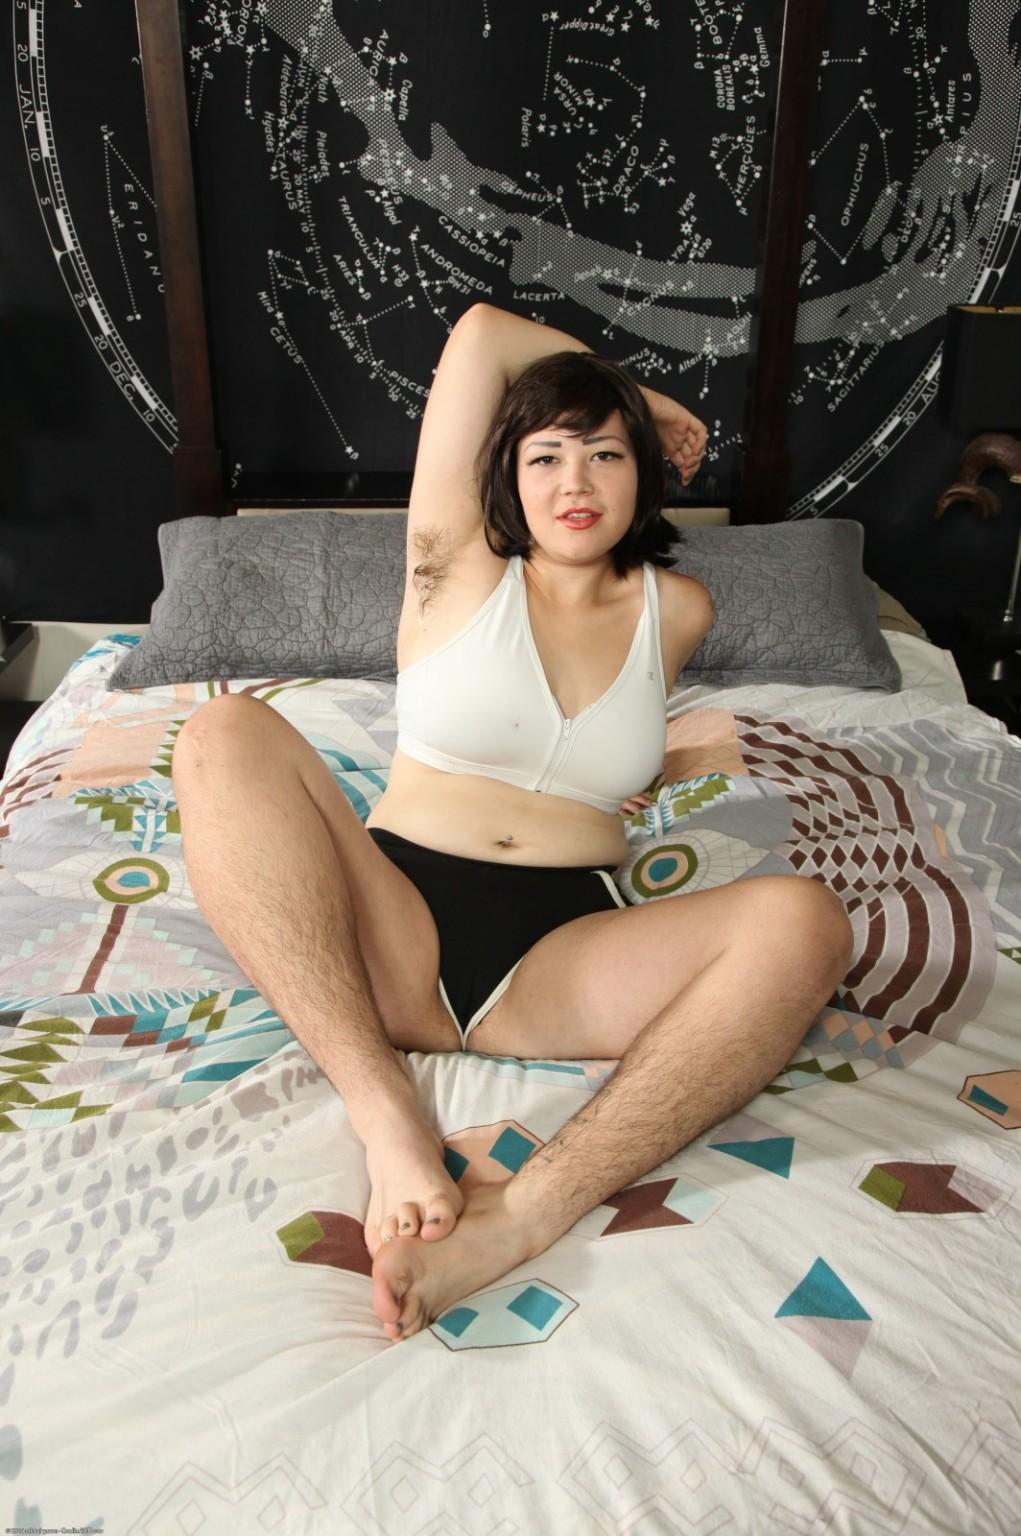 Chubby Asian Hairy Pussy